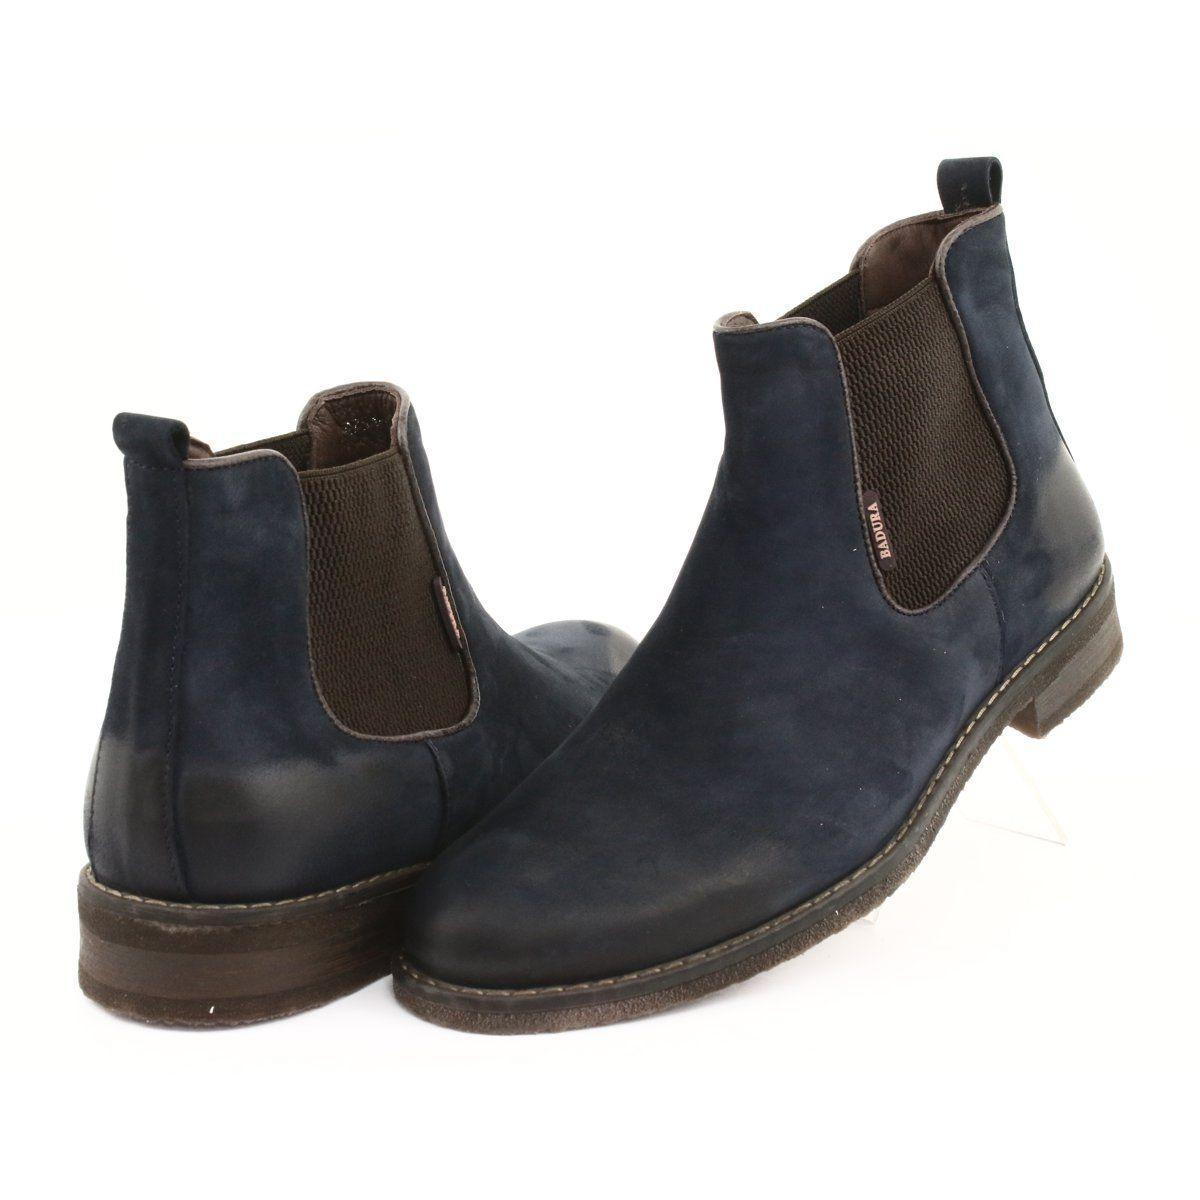 Elastic Sides Men S Badura Jodhpur Boots Slip On Badura 4754 Jodhpur Boots Boots Decorated Shoes